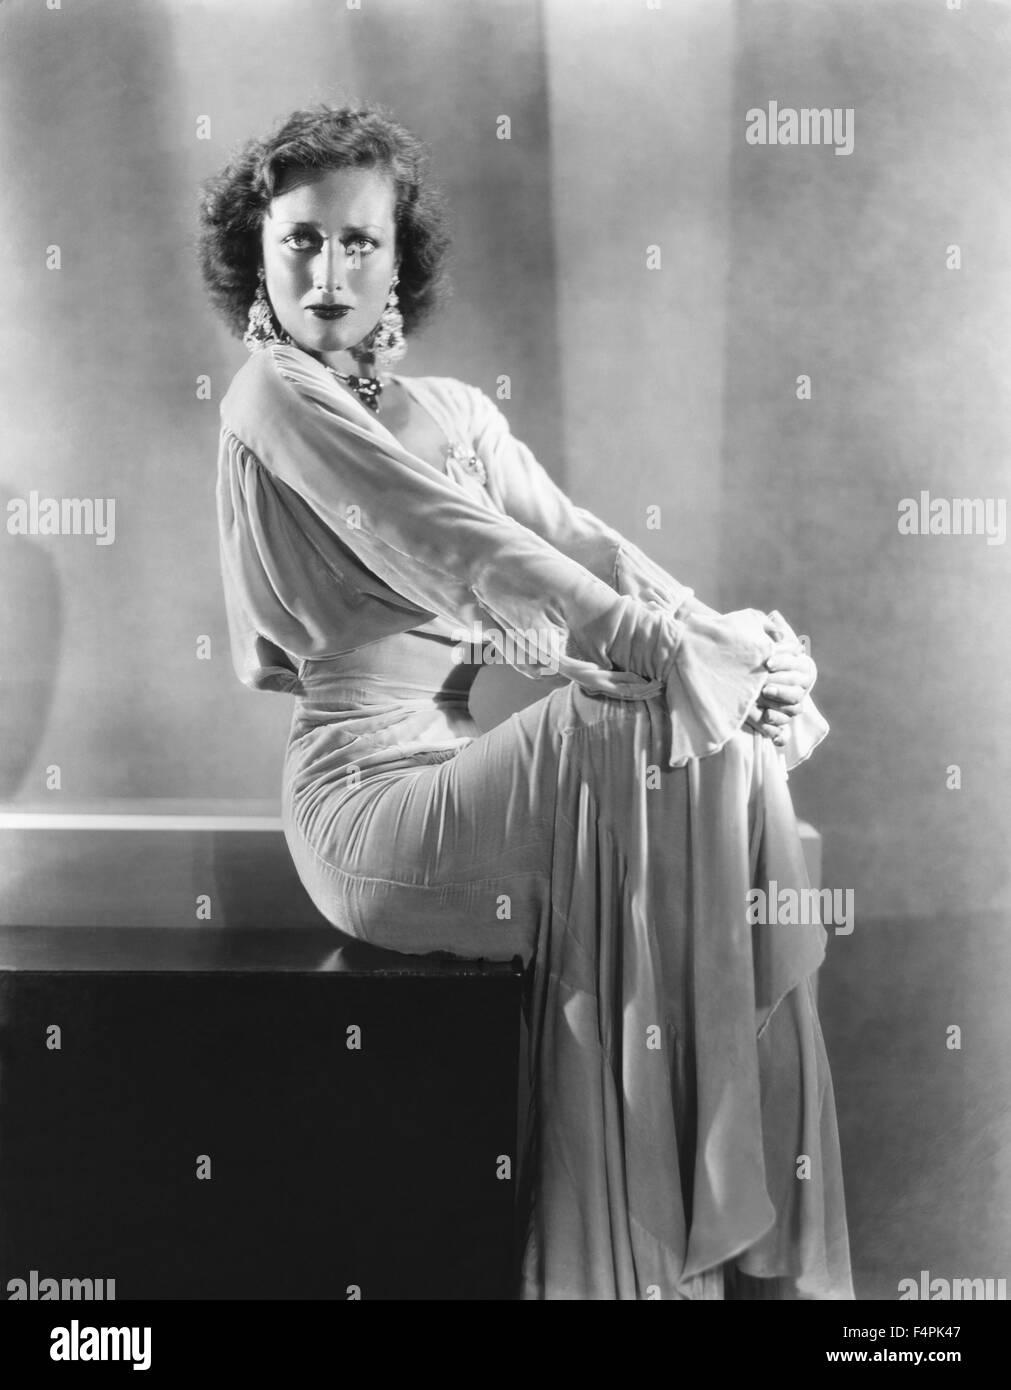 Joan Crawford 1928-1930 [Metro-Goldwyn-Mayer Pictures] - Stock Image